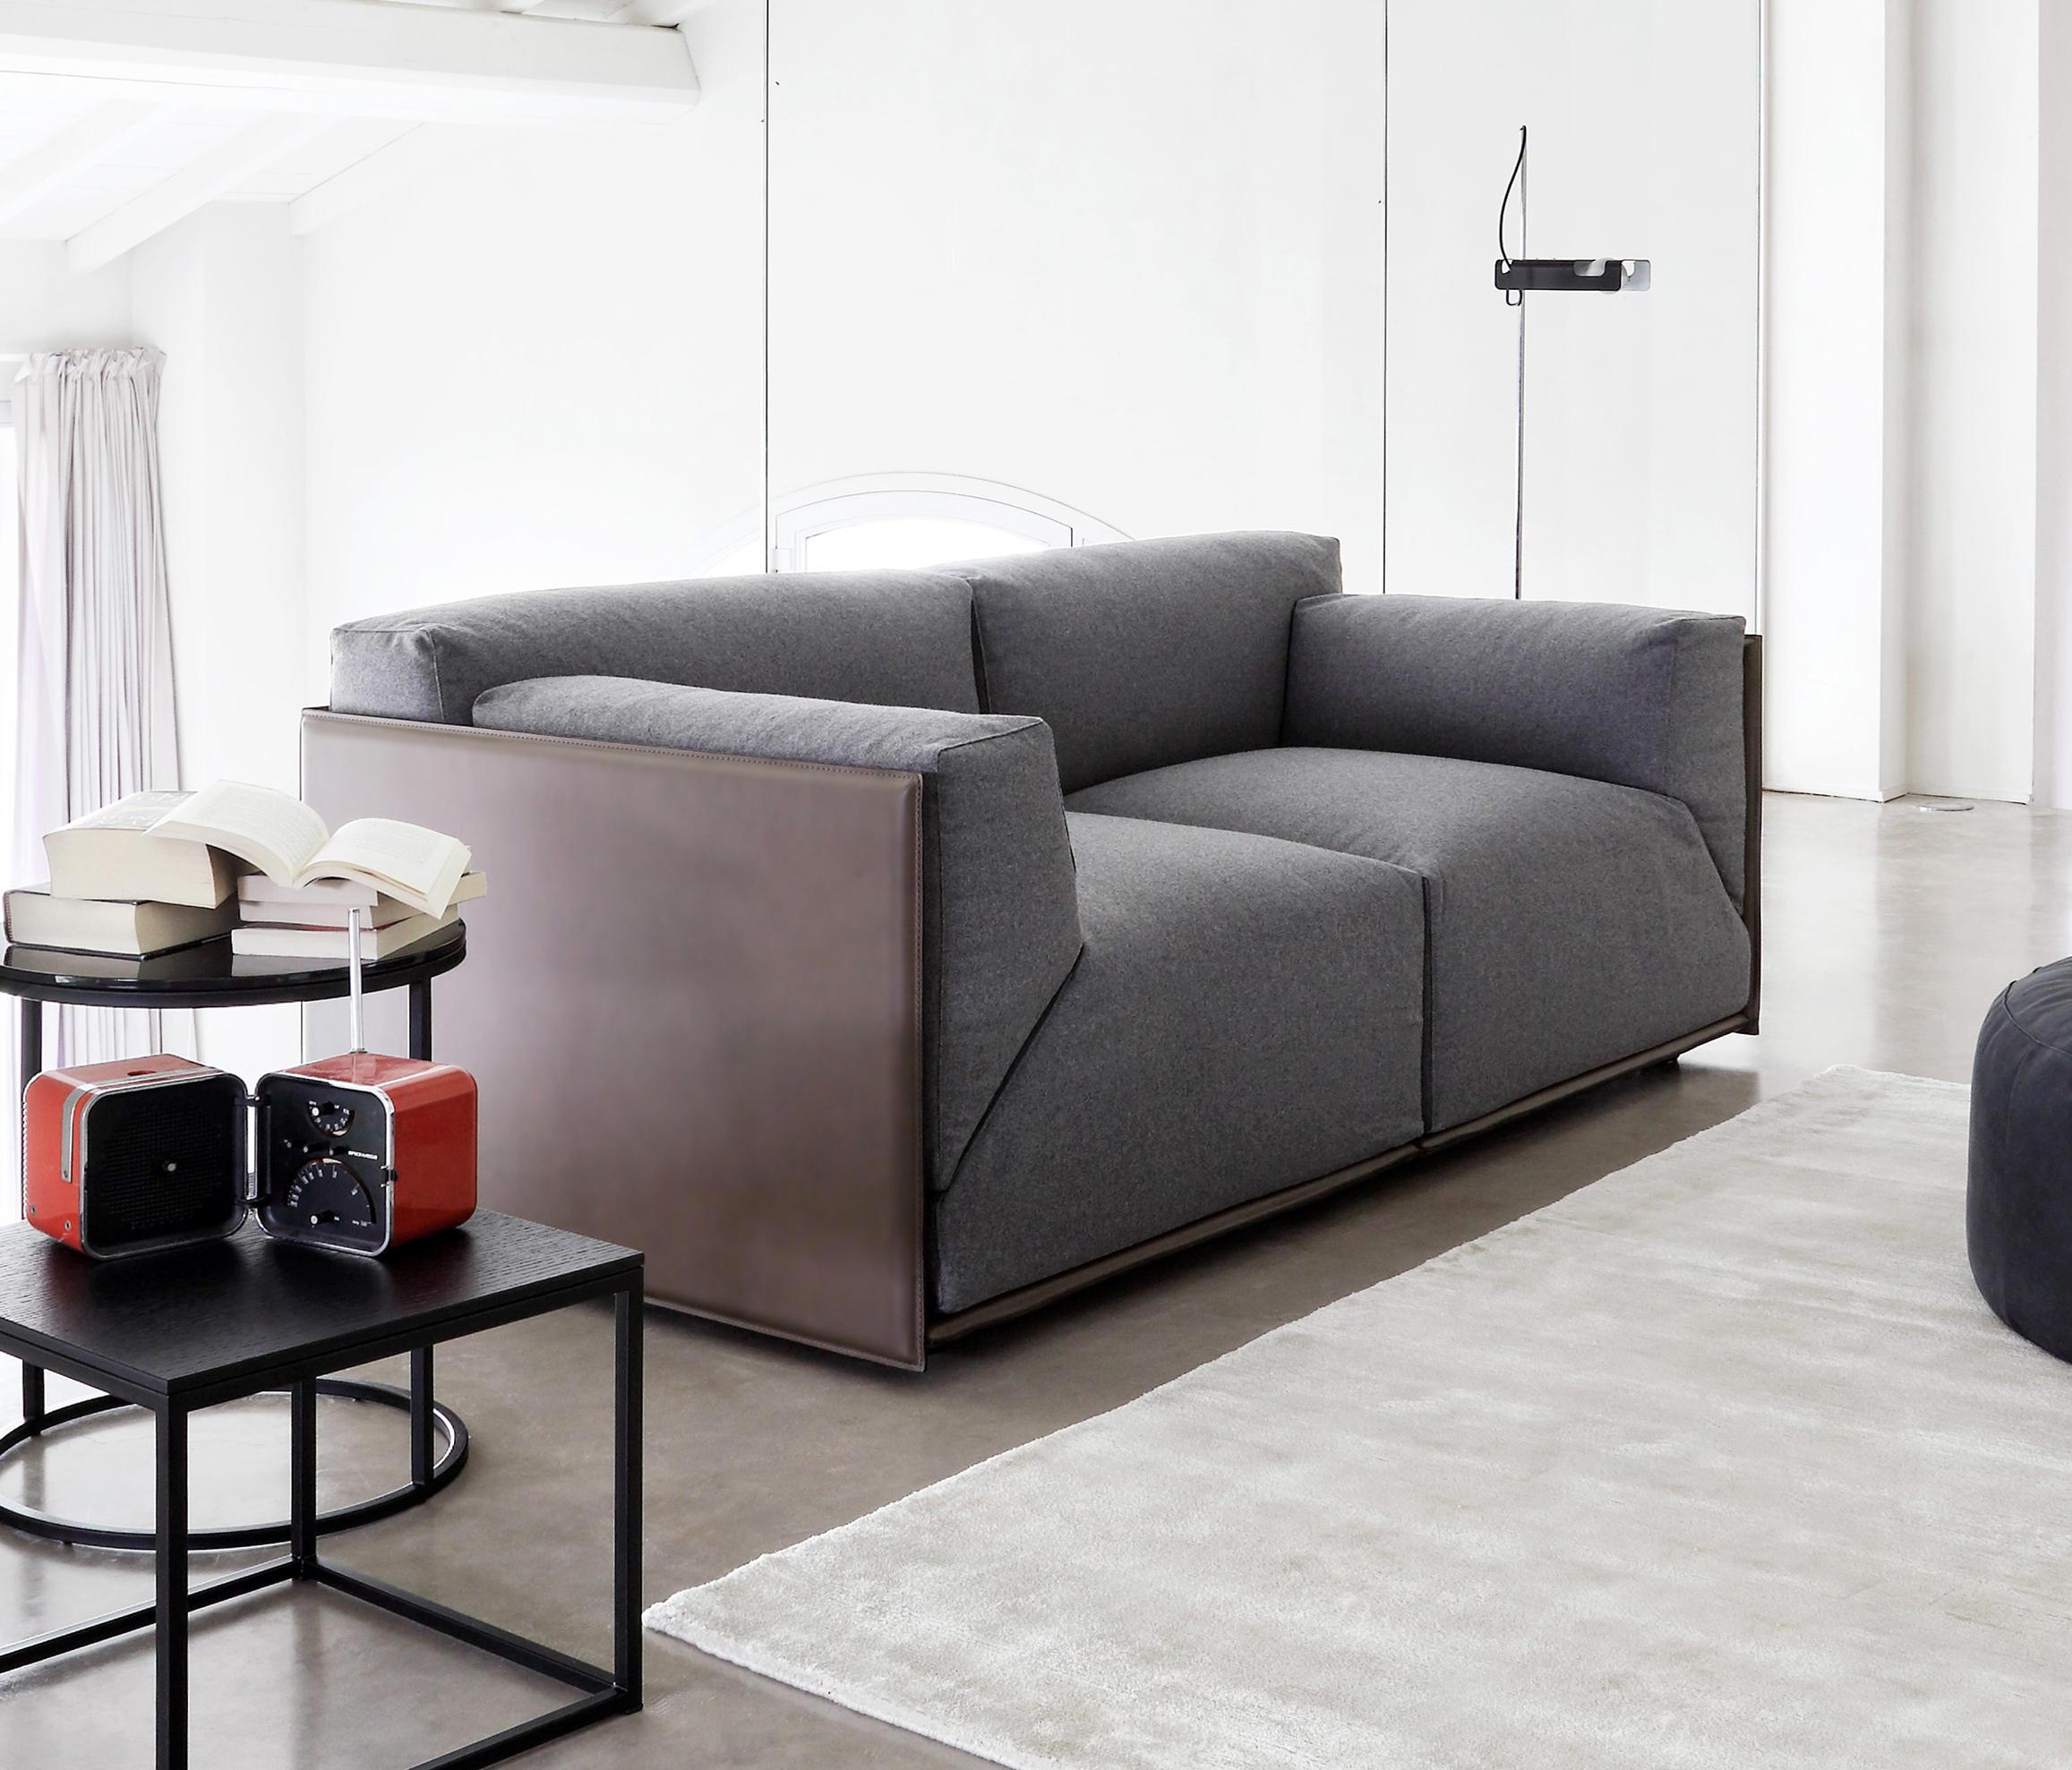 Bacon kuoio divani lounge meridiani architonic for Catalogo meridiani